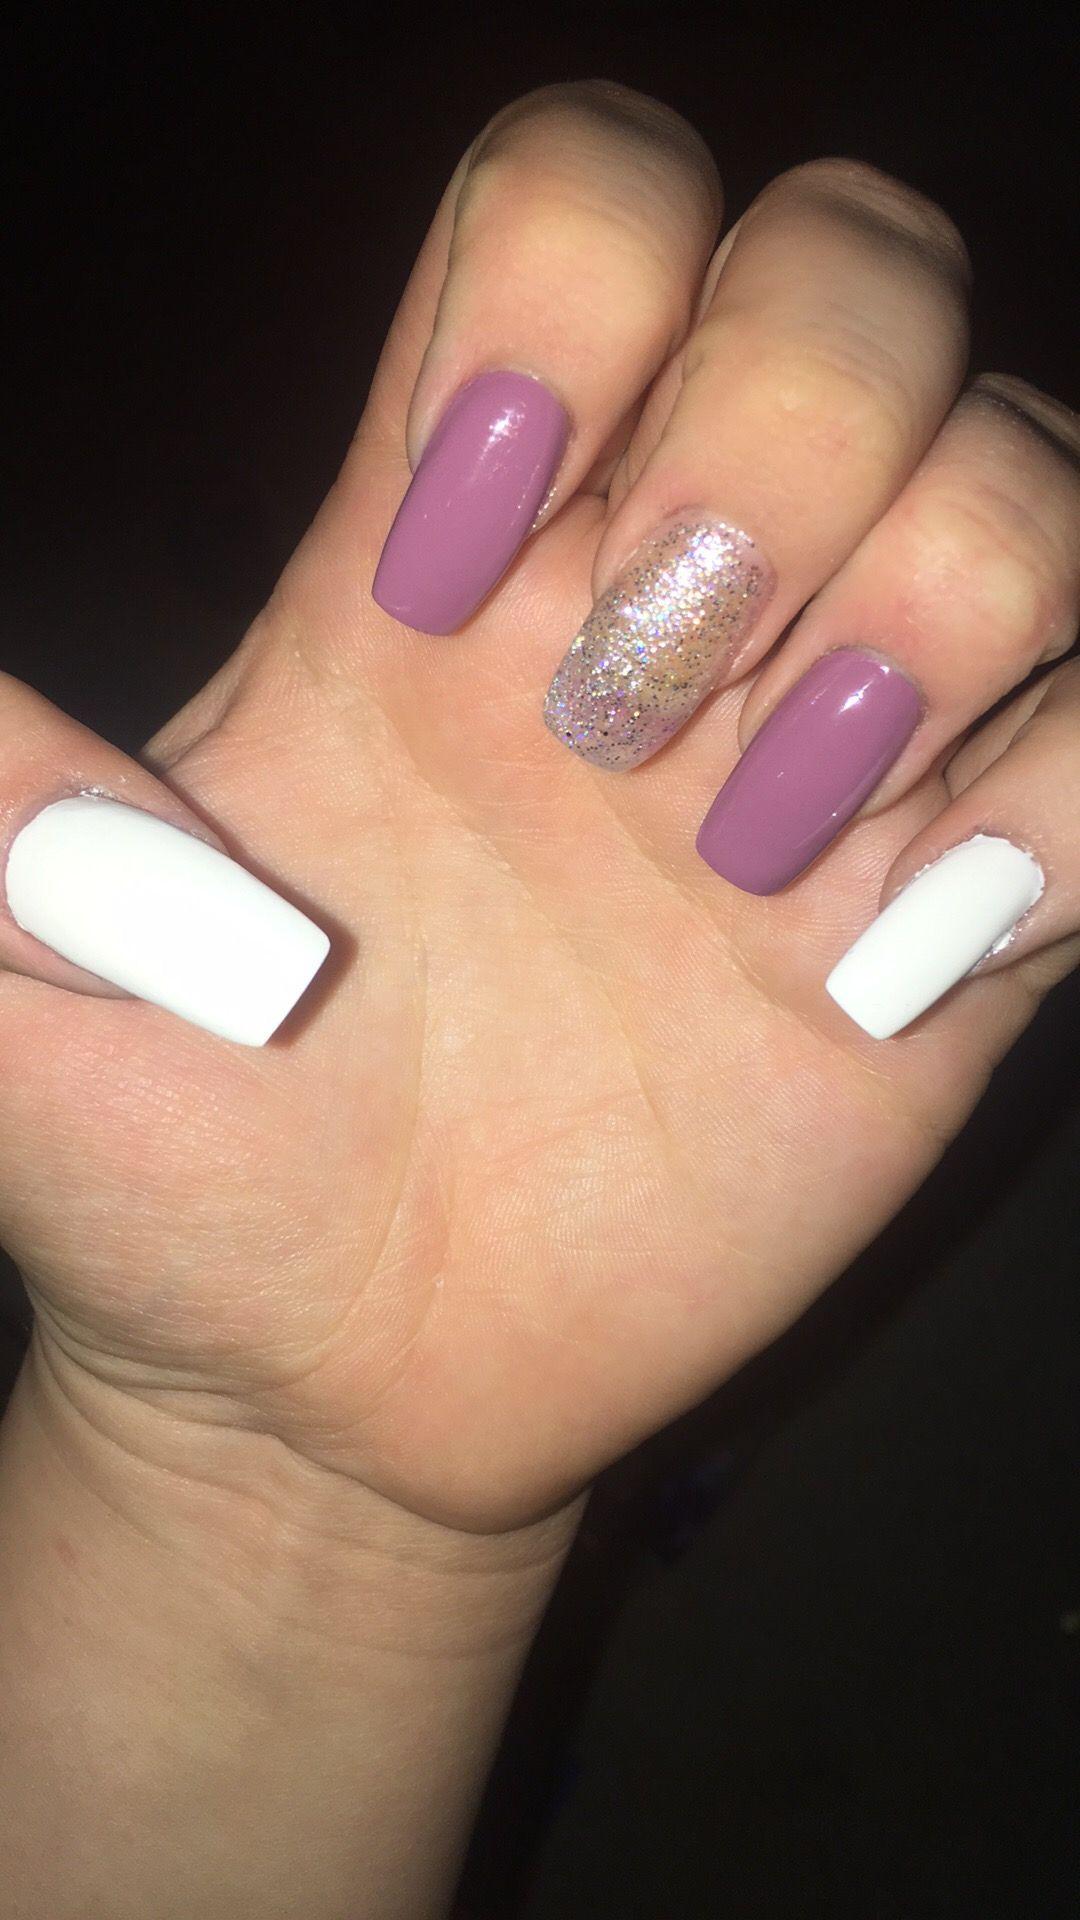 #weddingnails #acrylic | Wedding nails, Nails, Acrylic